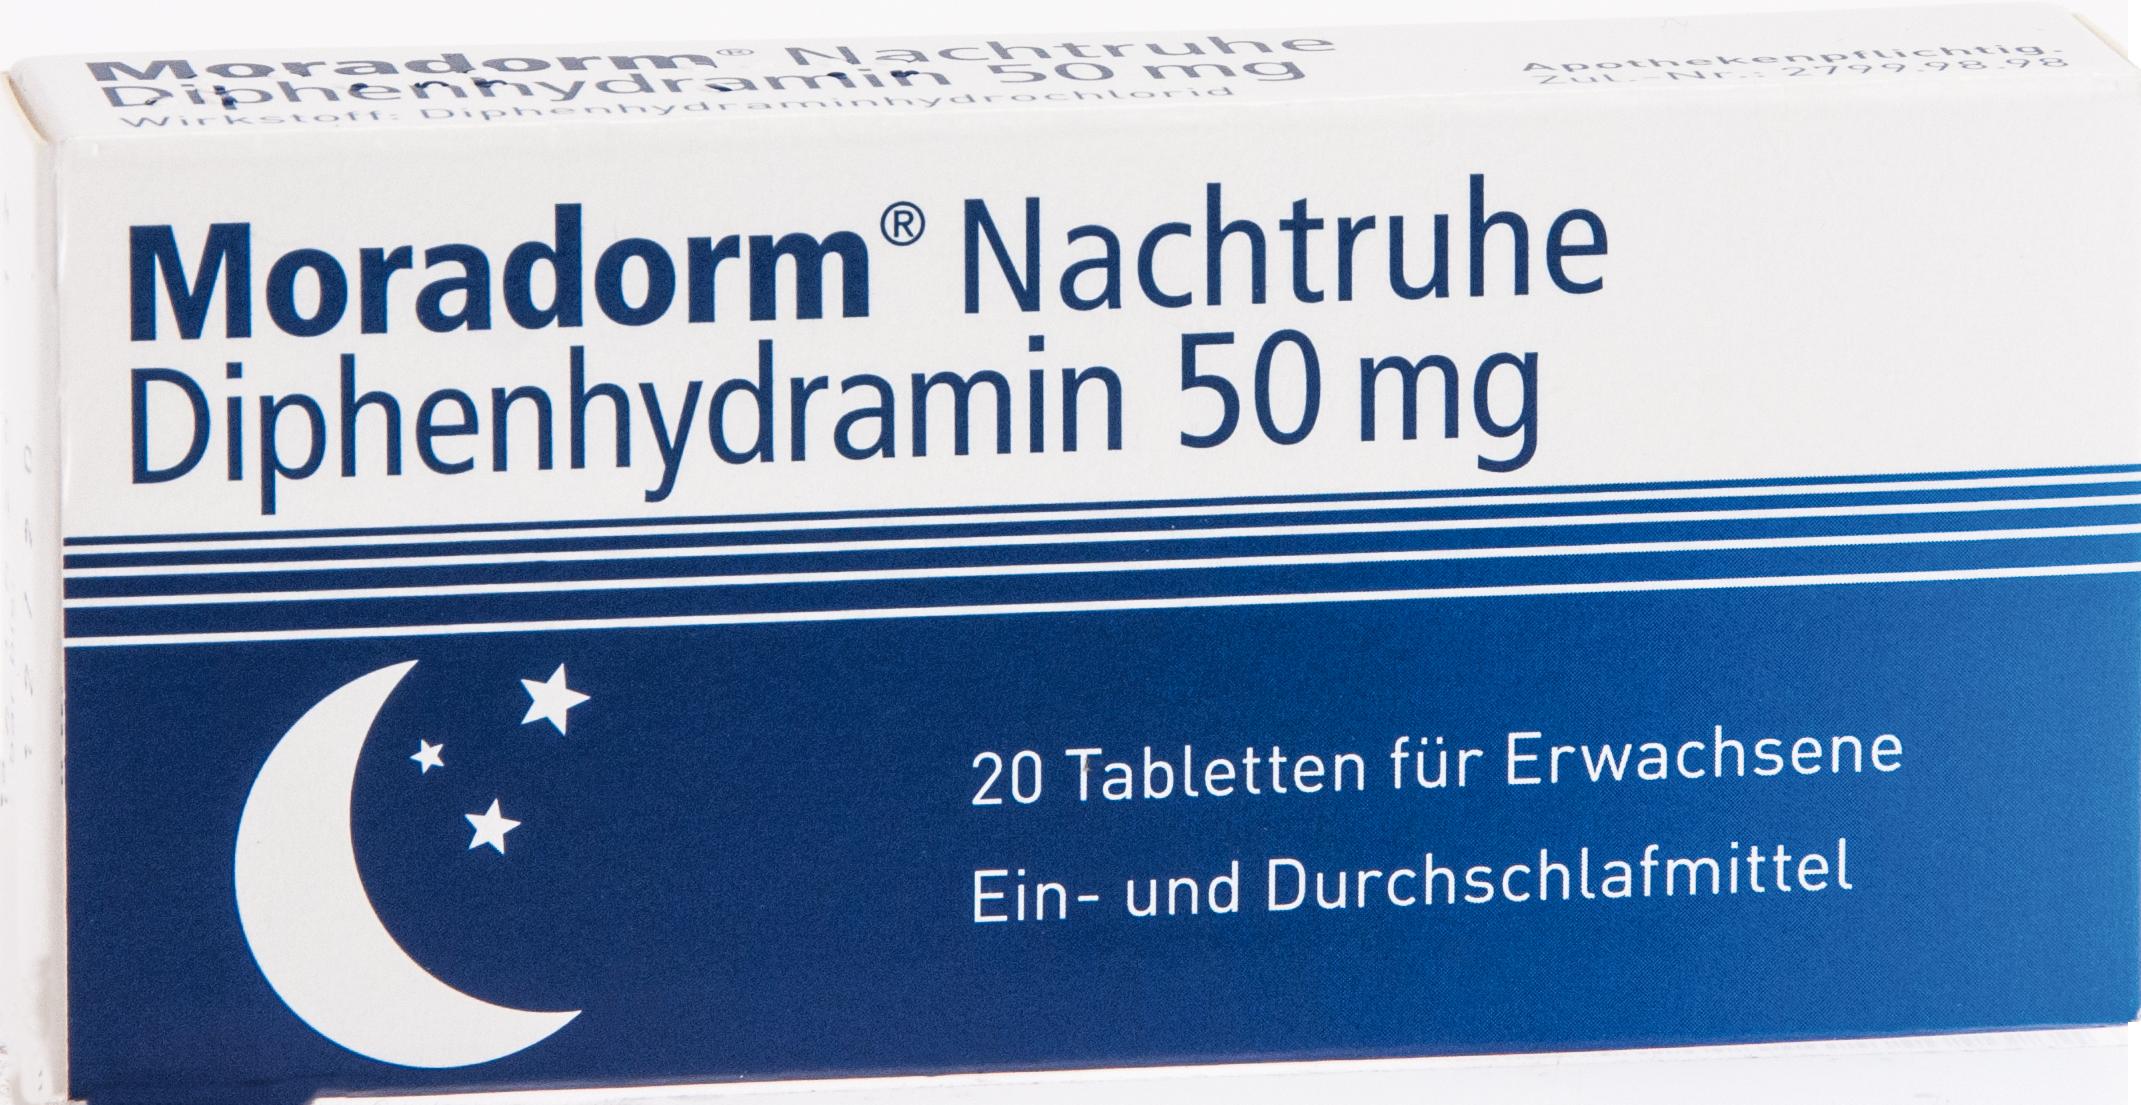 Moradorm Nachtruhe Diphenhydramin 50mg